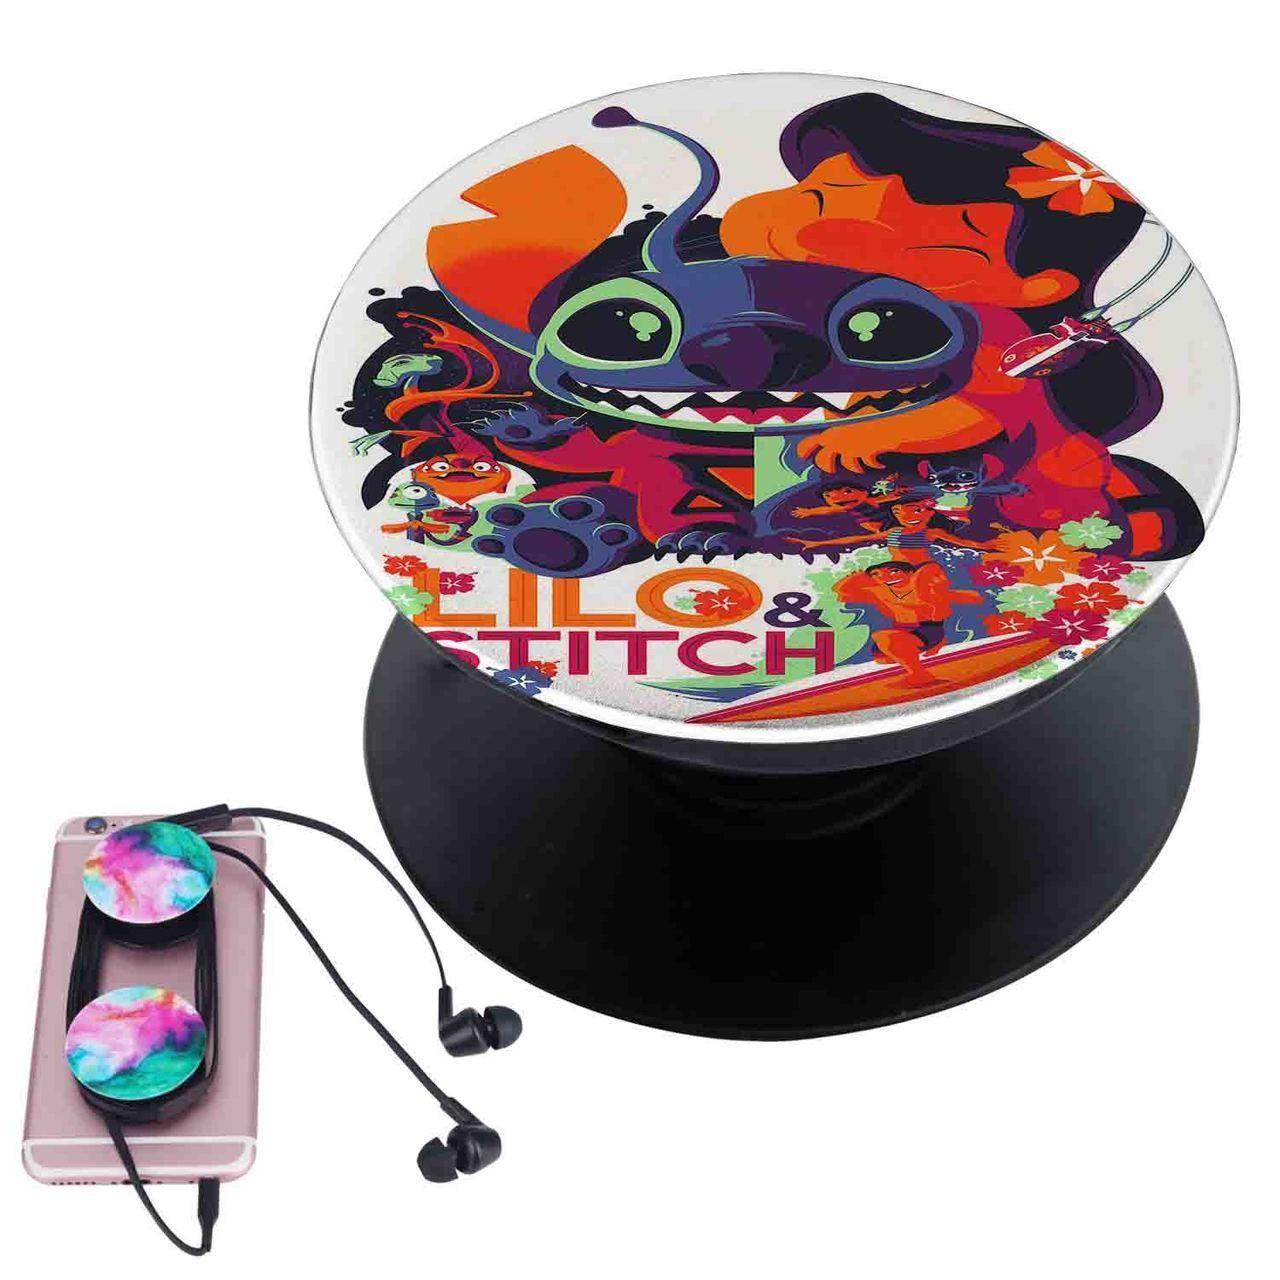 Disney lilo _ stitch custom popsocket pop out grip stand